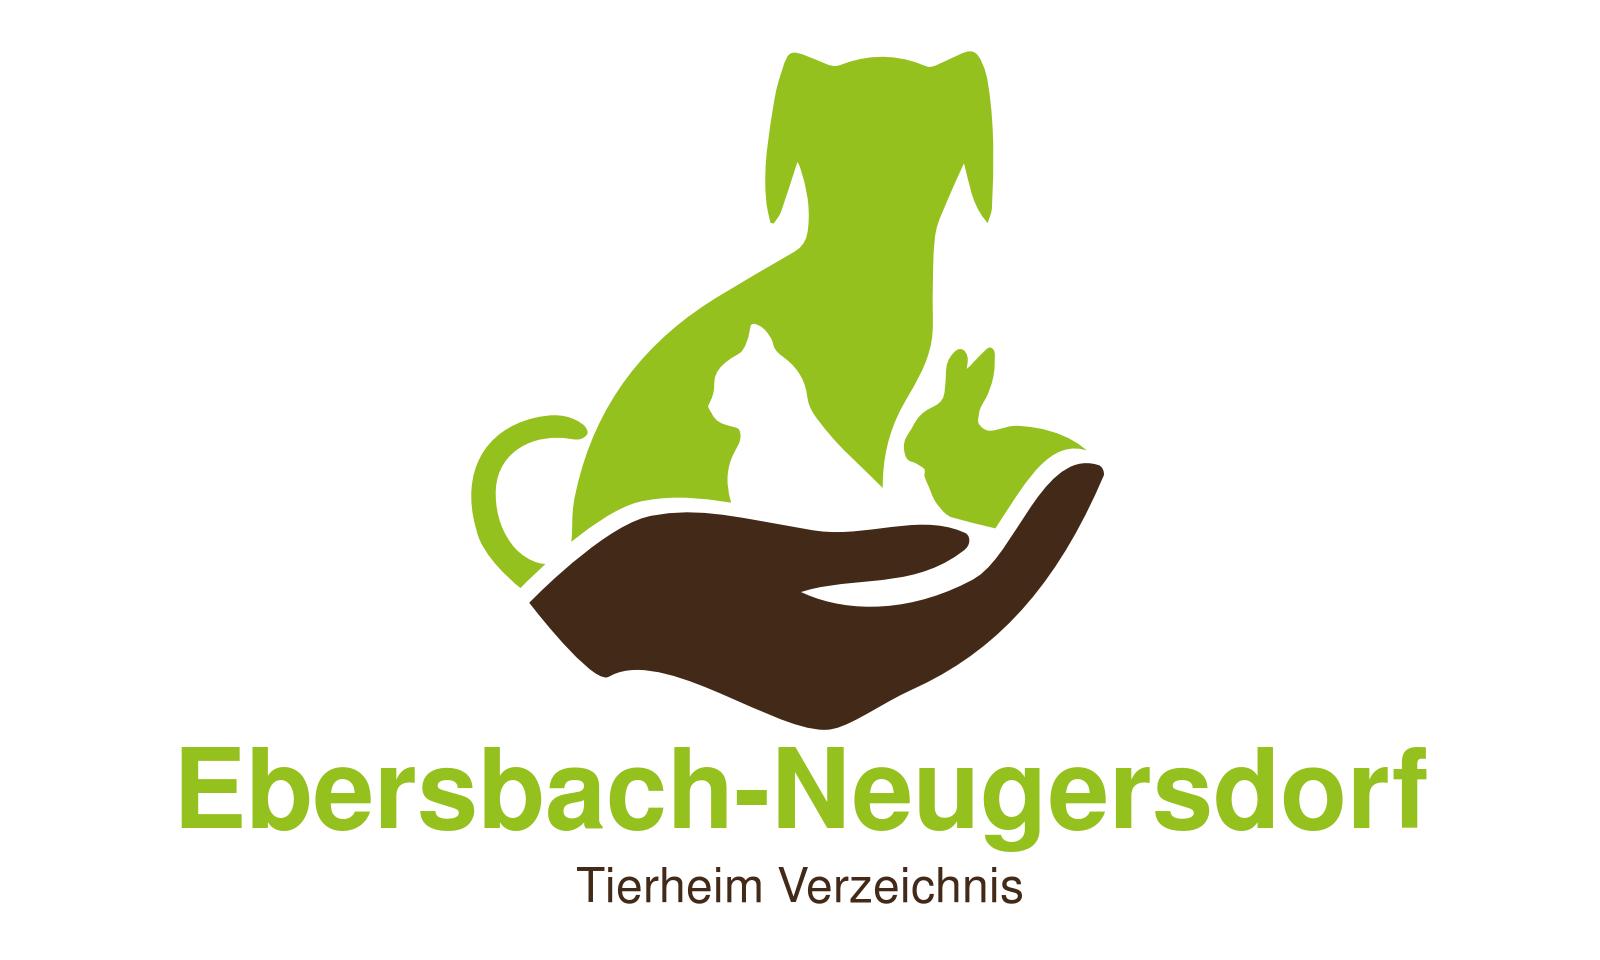 Tierheim Ebersbach-Neugersdorf